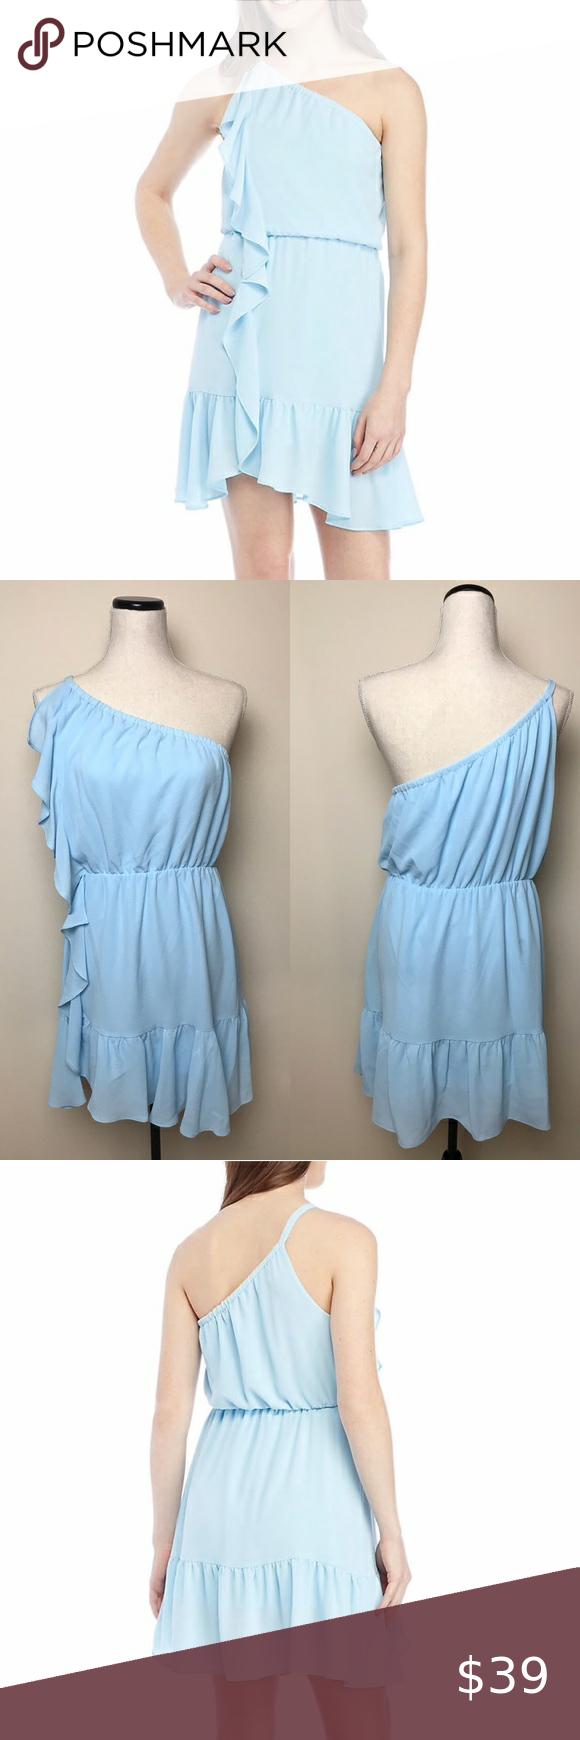 Kaari Blue One Shoulder Ruffle Baby Blue Dress One Shoulder Ruffle Baby Blue Dress Size L 17 5 Inches Arm Baby Blue Dresses Blue Dresses Dress Size Chart Women [ 1740 x 580 Pixel ]